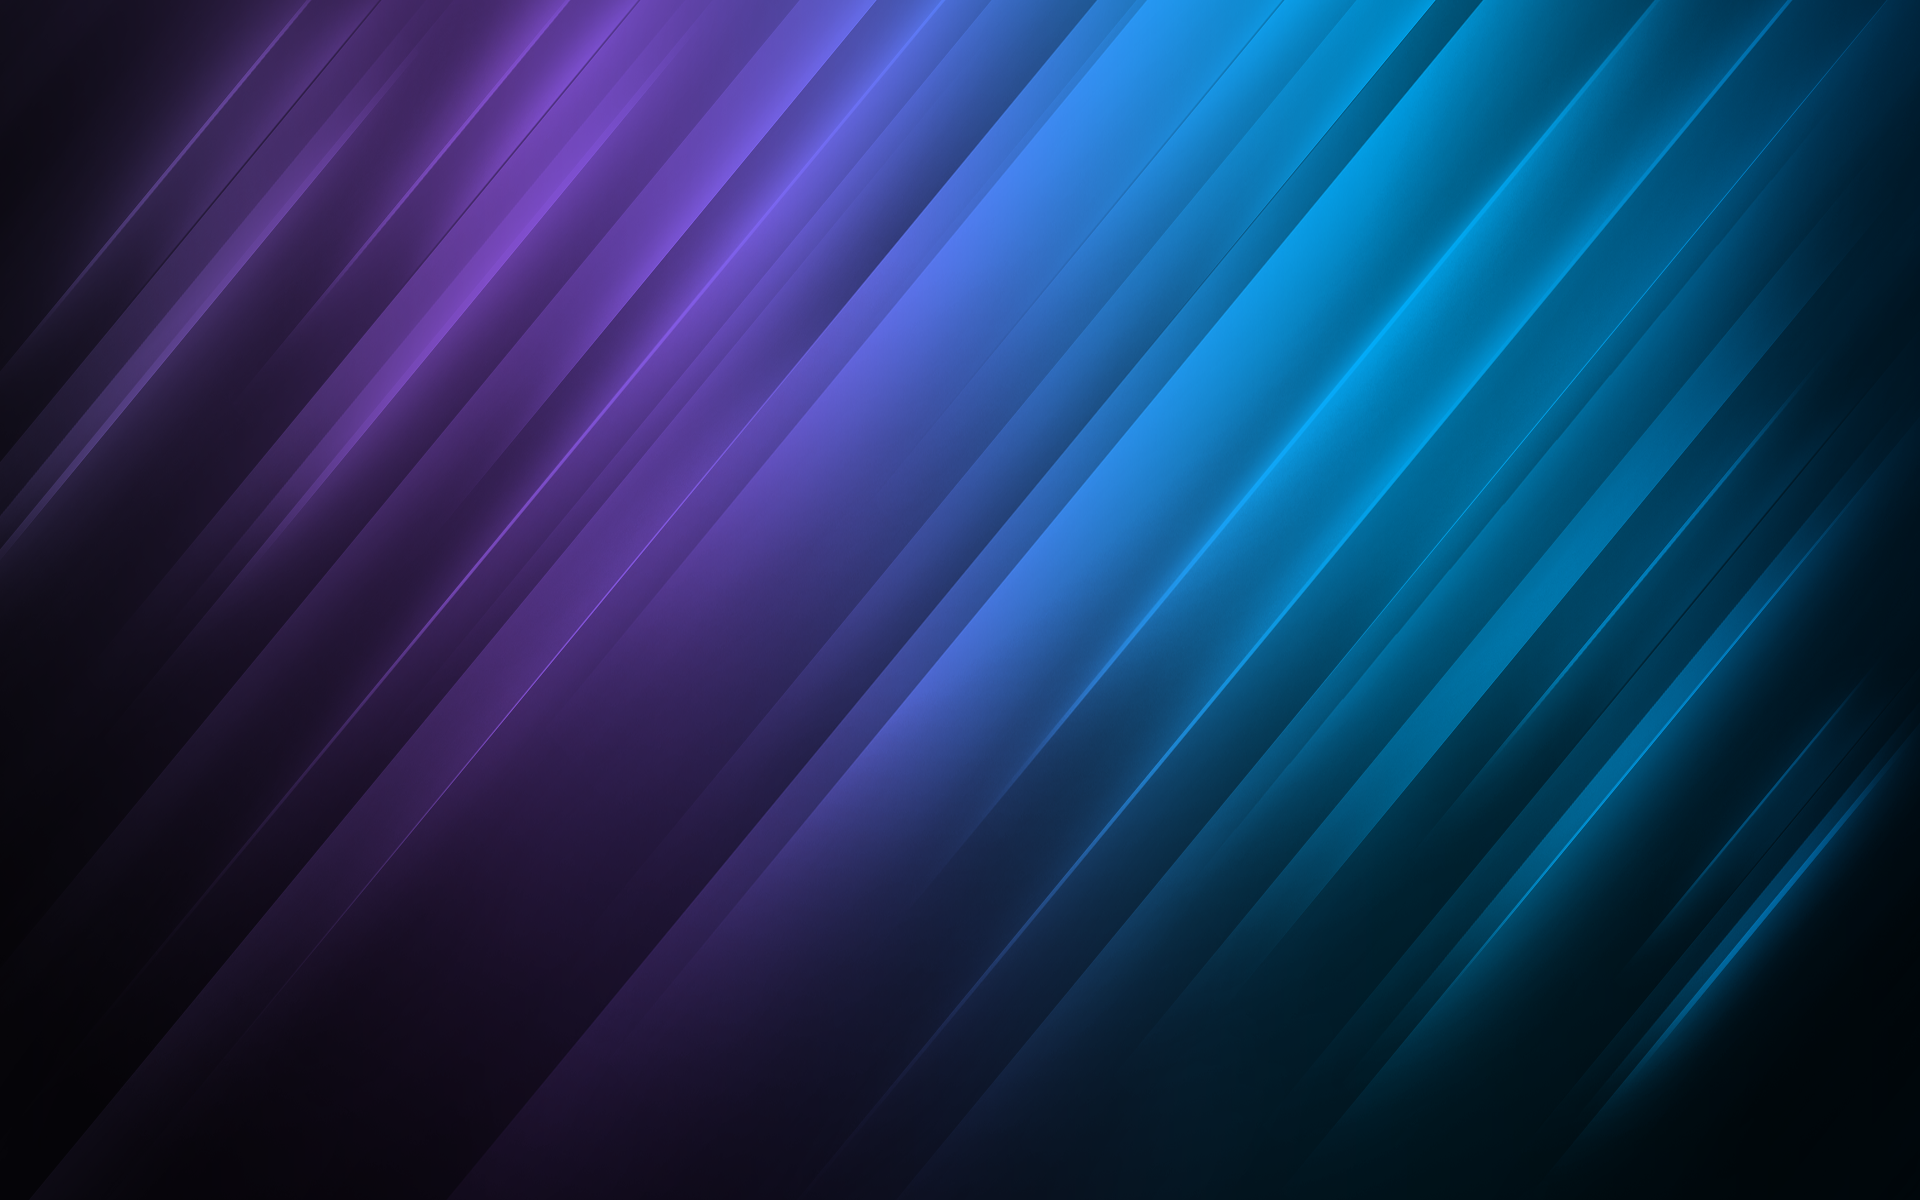 Purple and Turquoise Wallpaper - WallpaperSafari